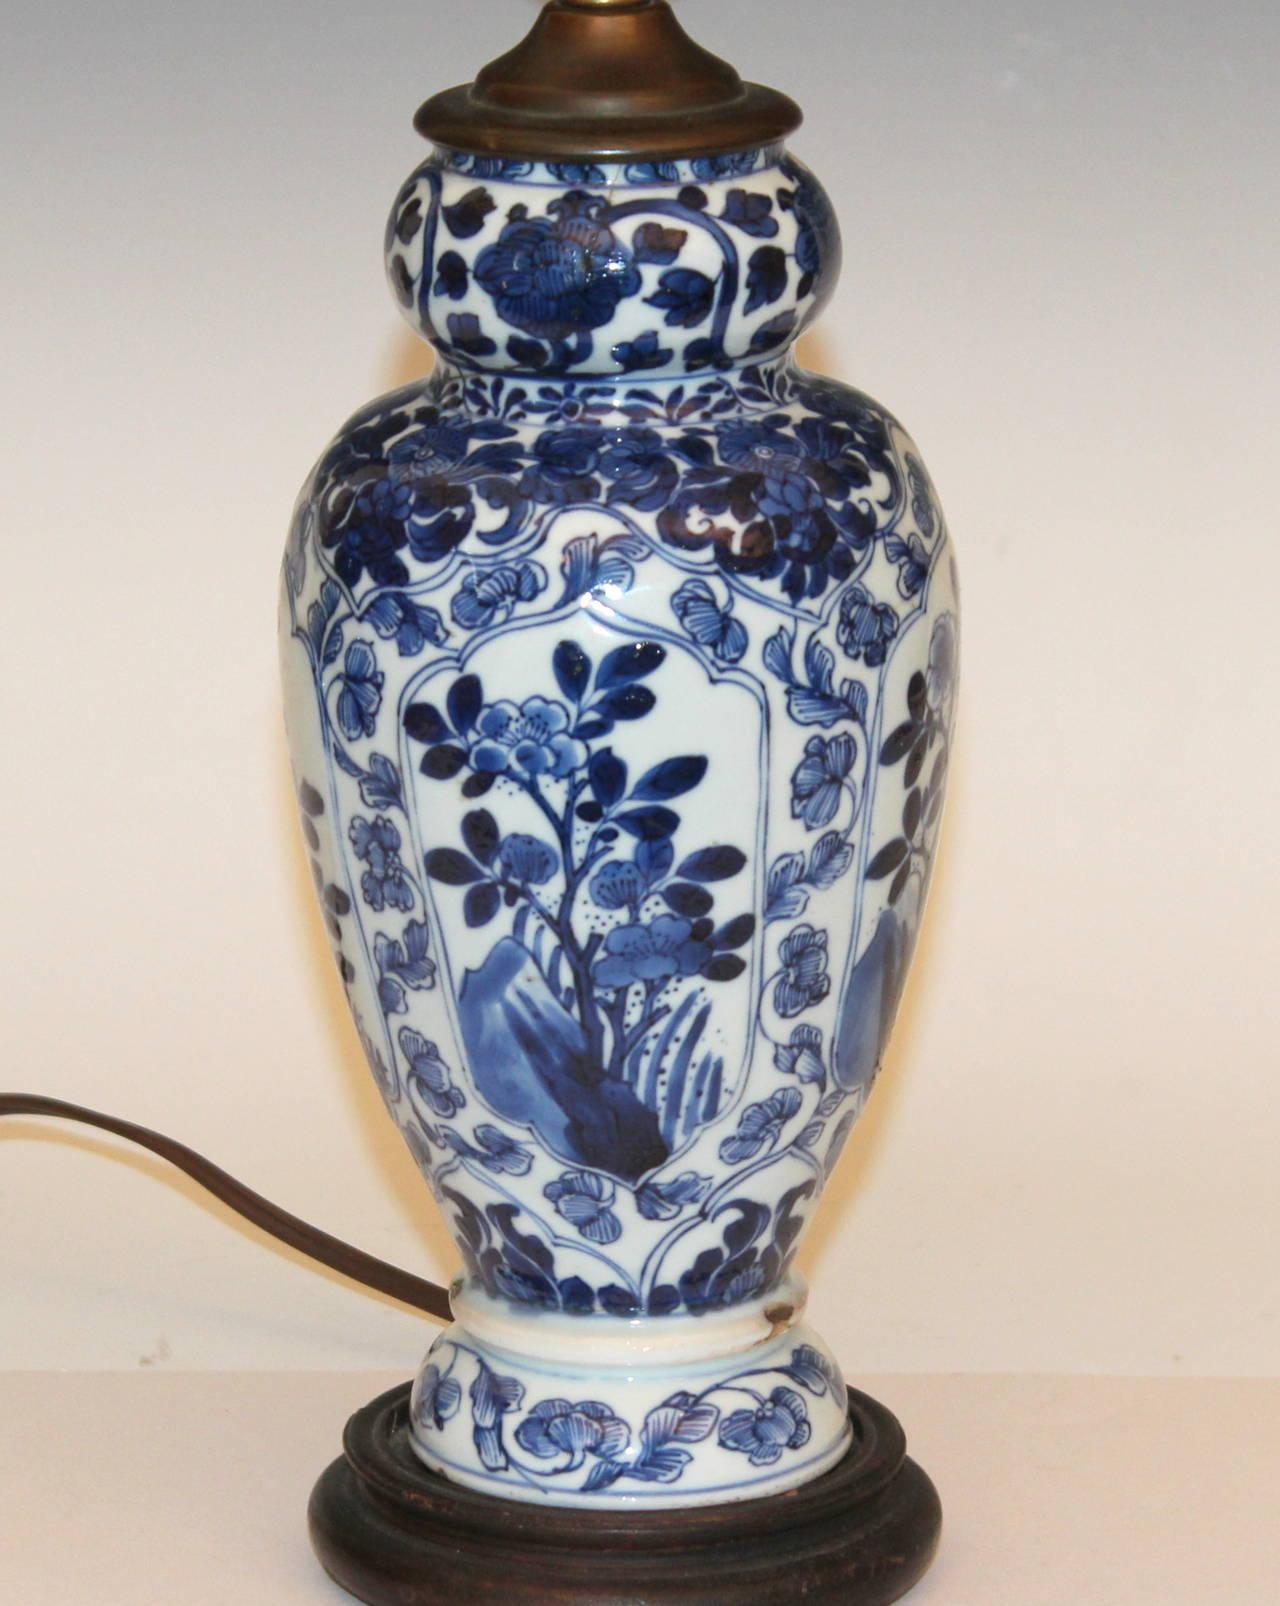 Antique chinese porcelain kangxi 18th century blue and white vase qing antique chinese porcelain kangxi 18th century blue and white vase lamp for sale reviewsmspy